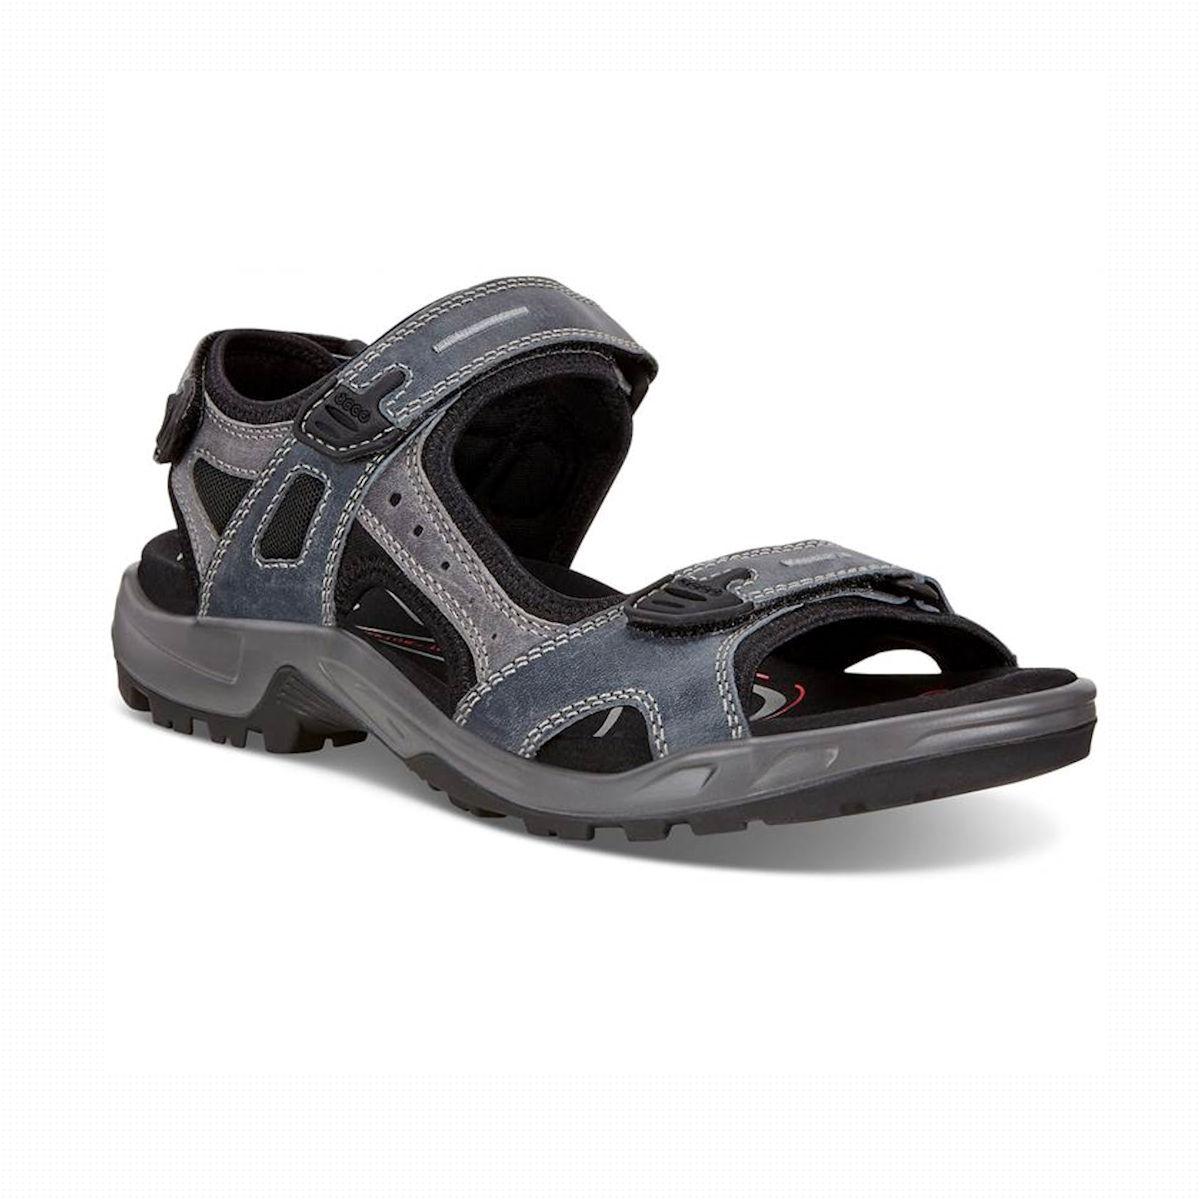 ECCO Offroad - Mens Marine Blue Sandal